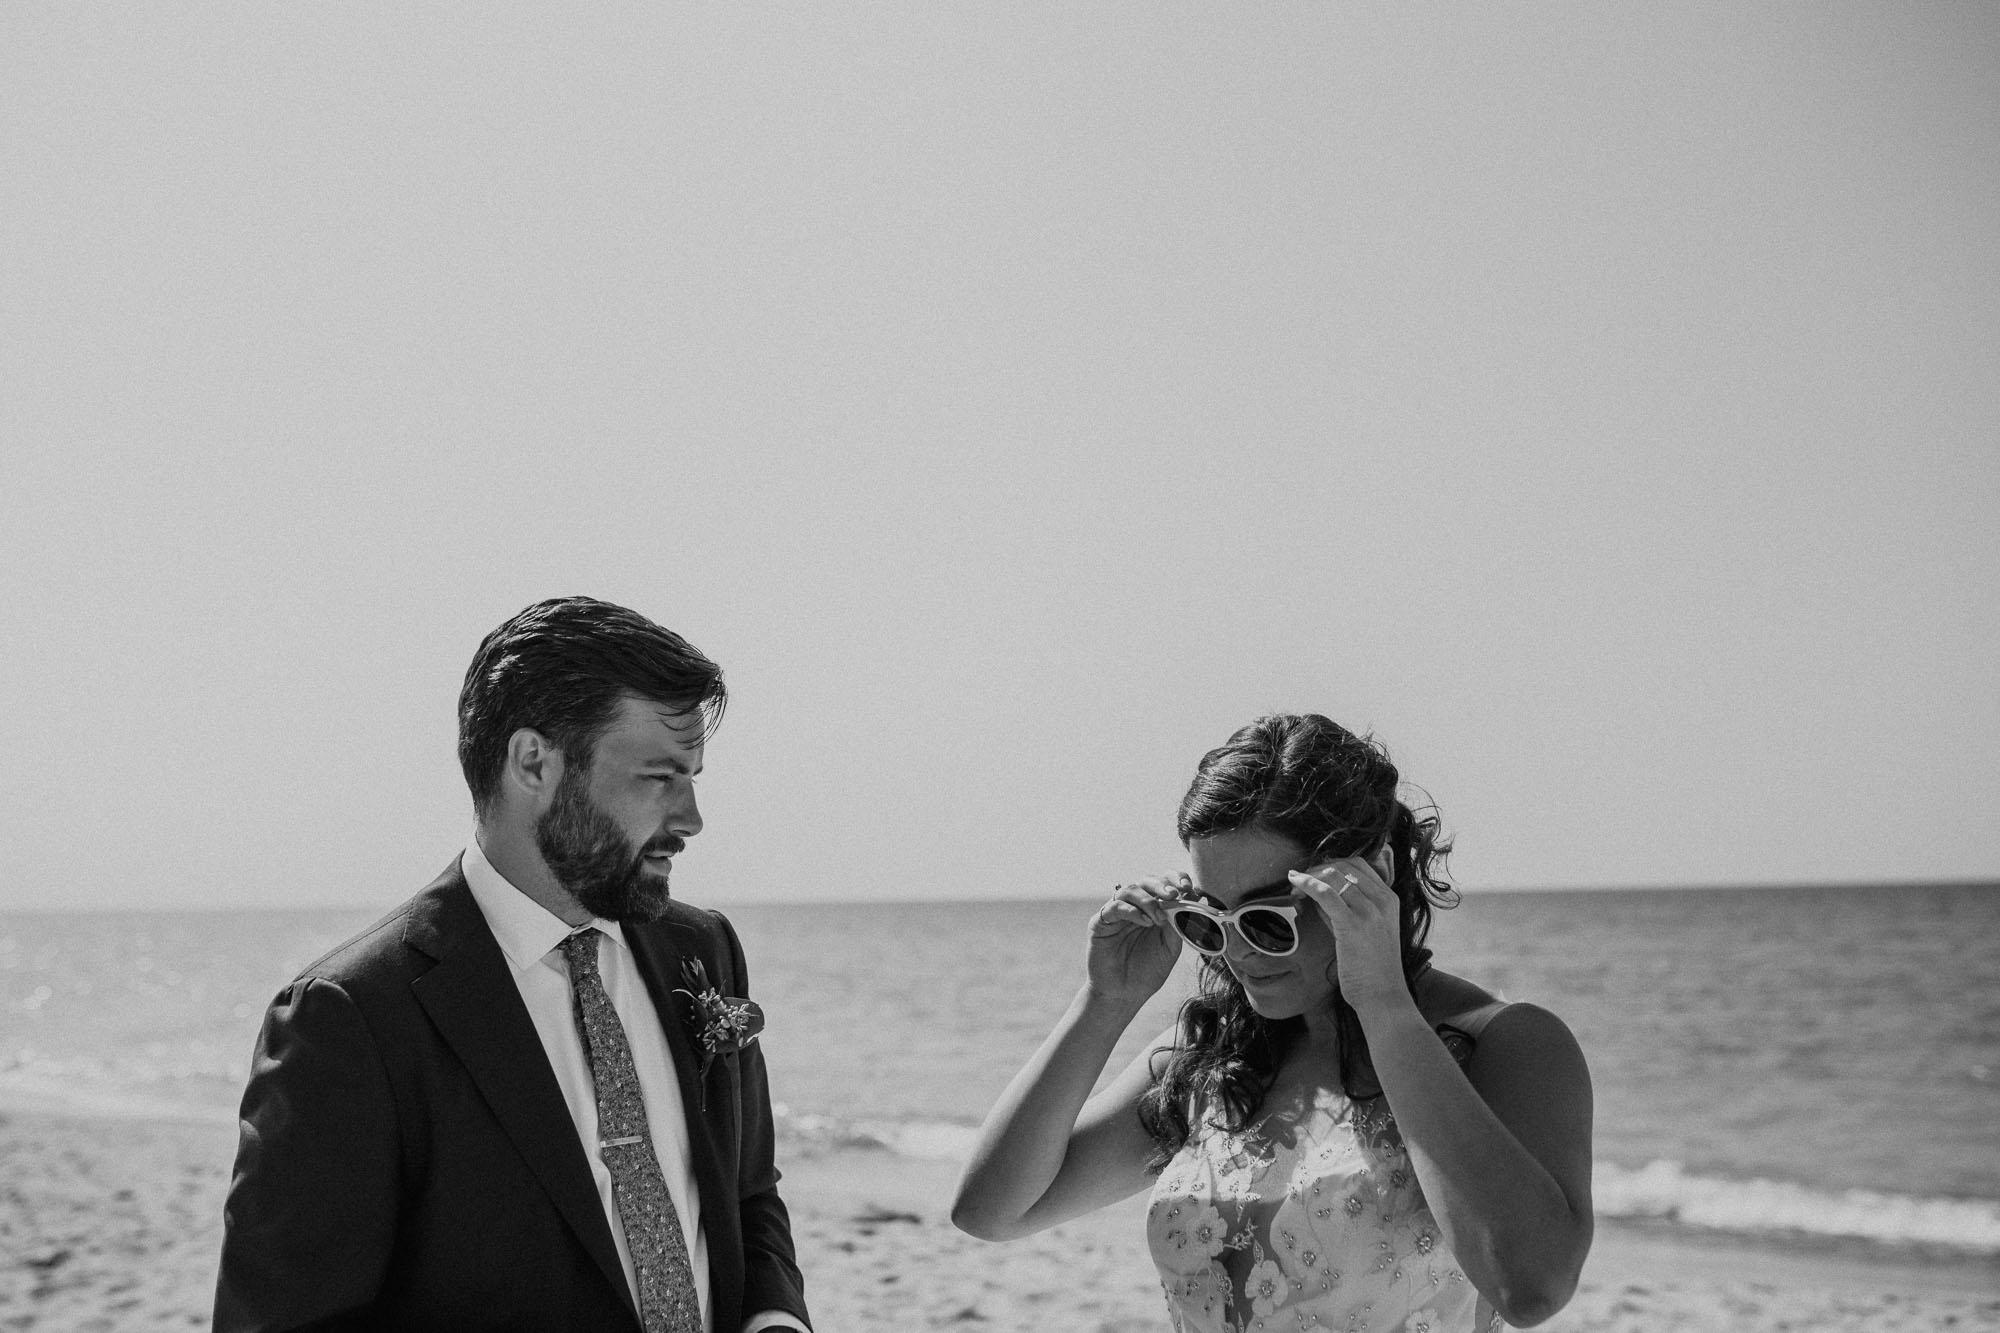 journeyman_distillery_wedding_photographer_chicago_il_wright_photographs-2988.jpg